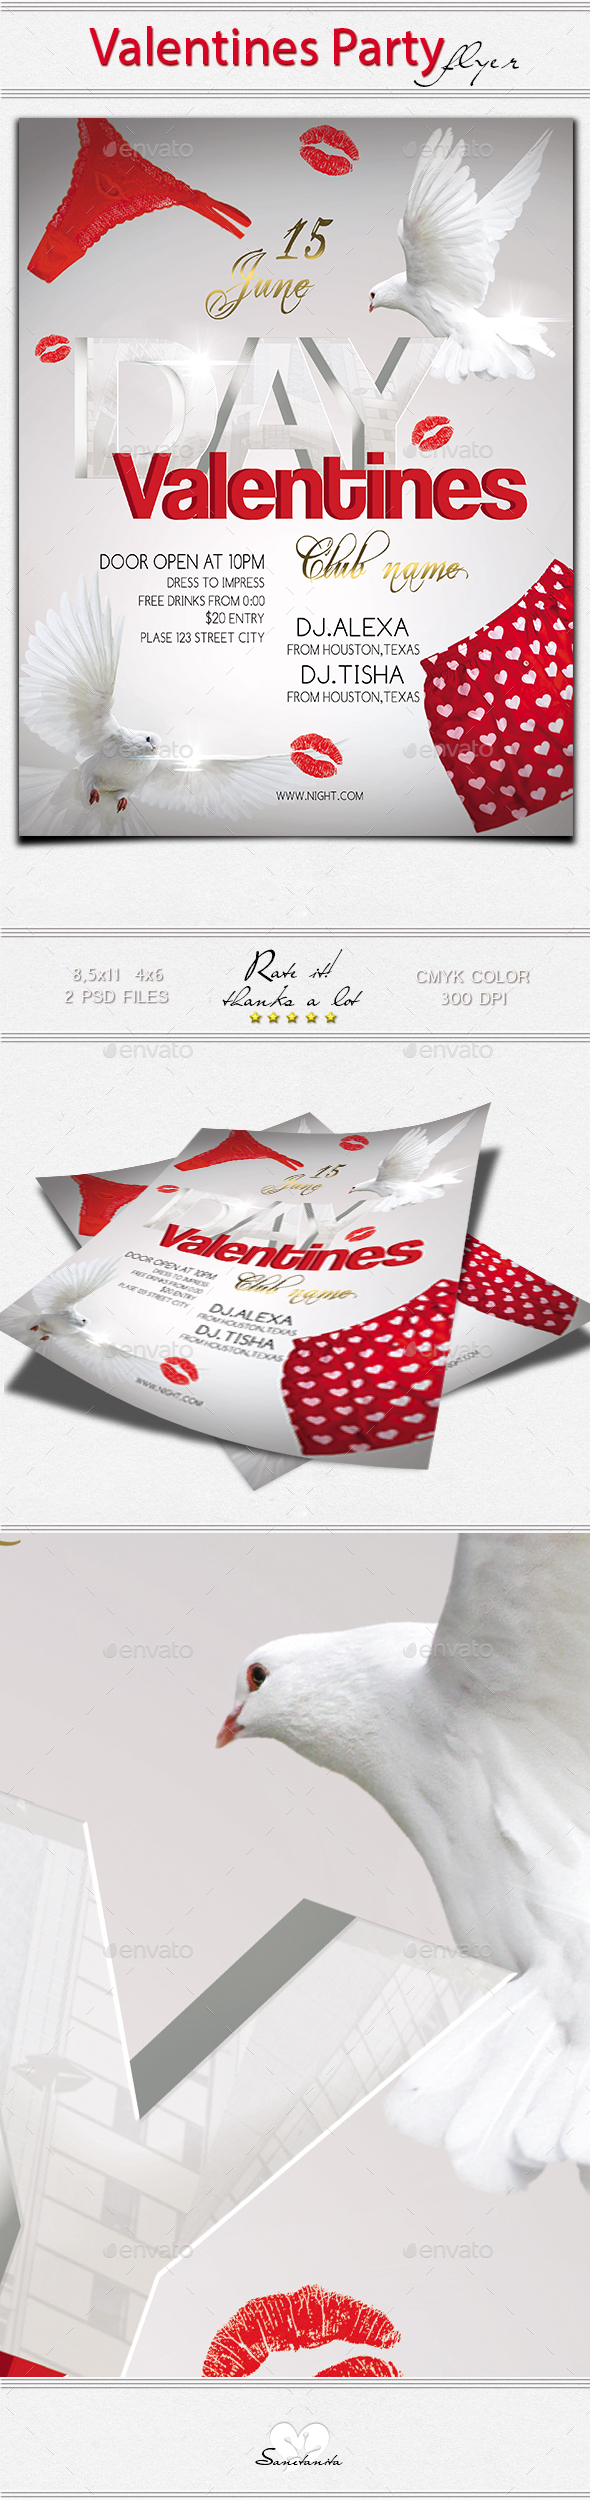 Valentines Day Flyer NEW